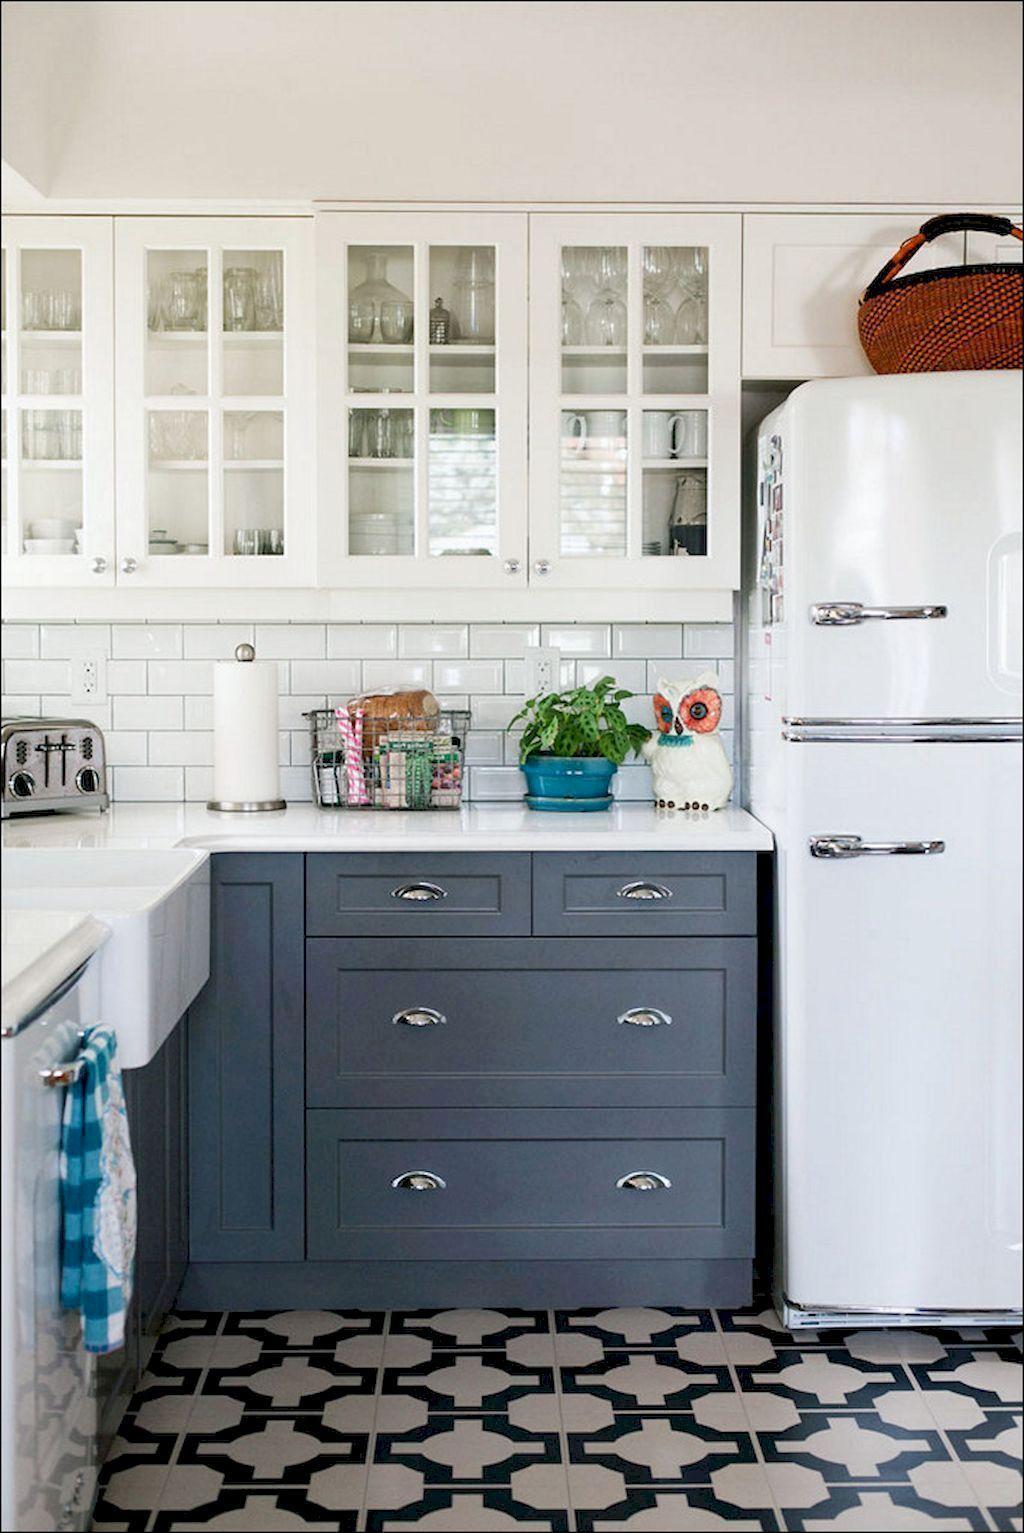 Adorable 80 Gorgeous Farmhouse Gray Kitchen Cabinet Design Ideas Https Rusticroom Co 3884 80 Gorge Dark Blue Kitchen Cabinets Kitchen Renovation Grey Kitchen